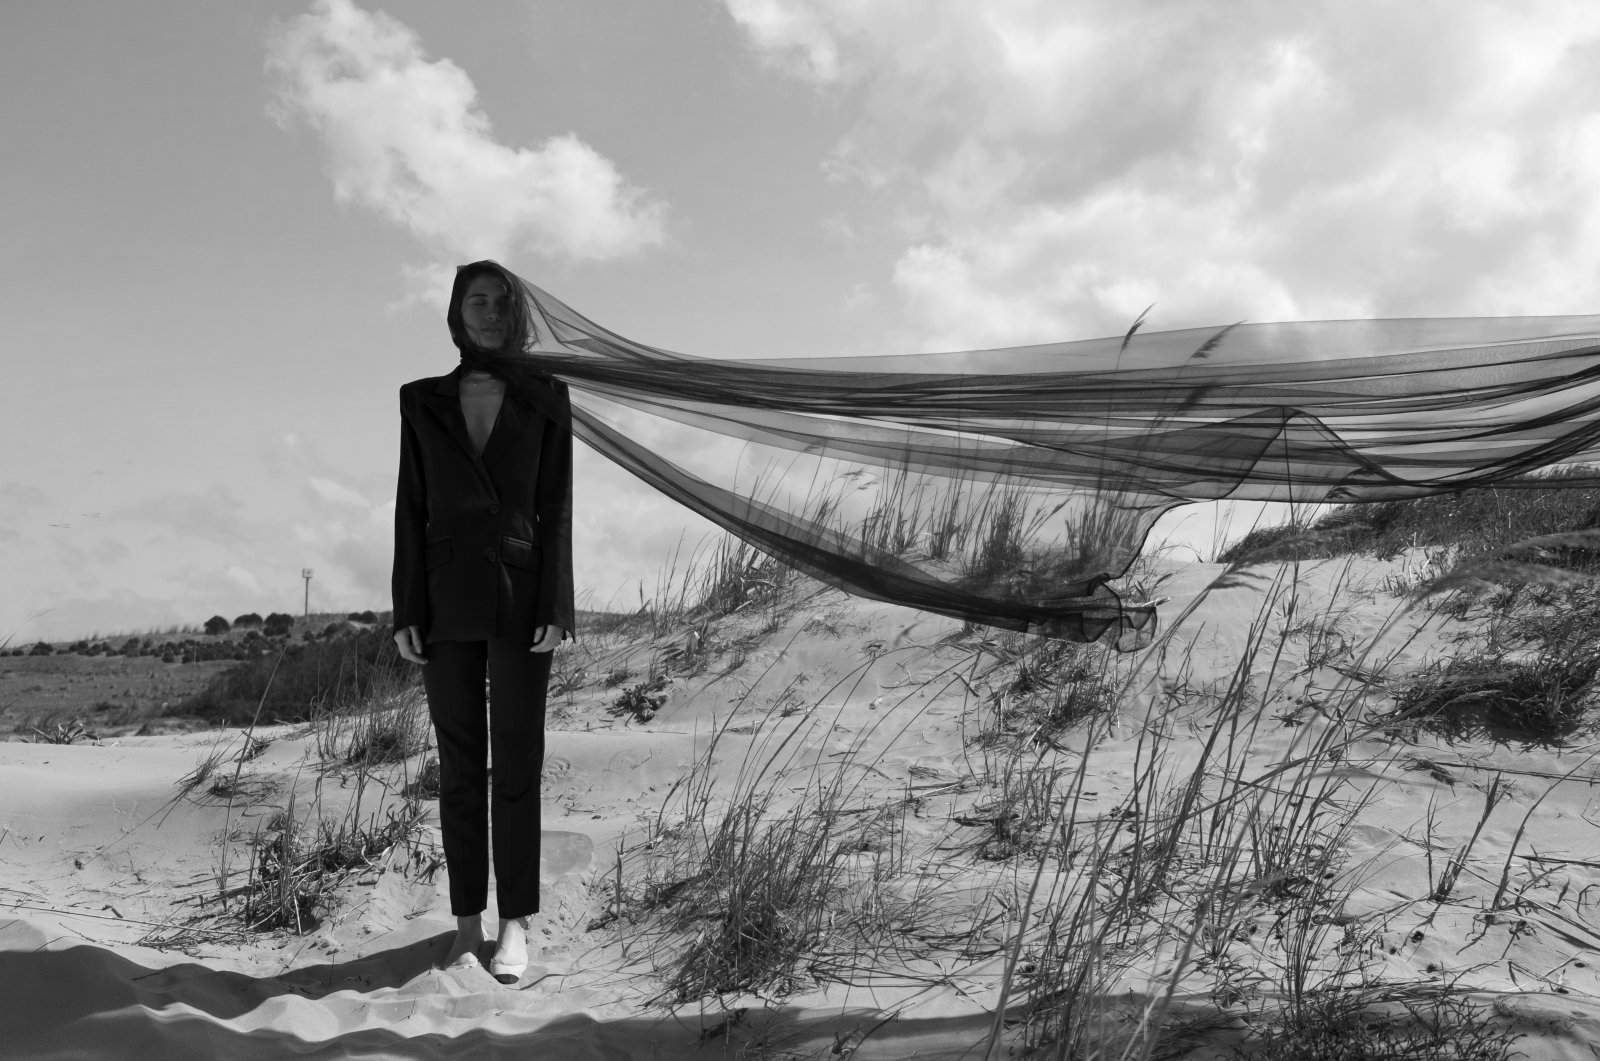 A blazer pantsuit from Eon. (Photo courtesy of Tuğba Atasoy)